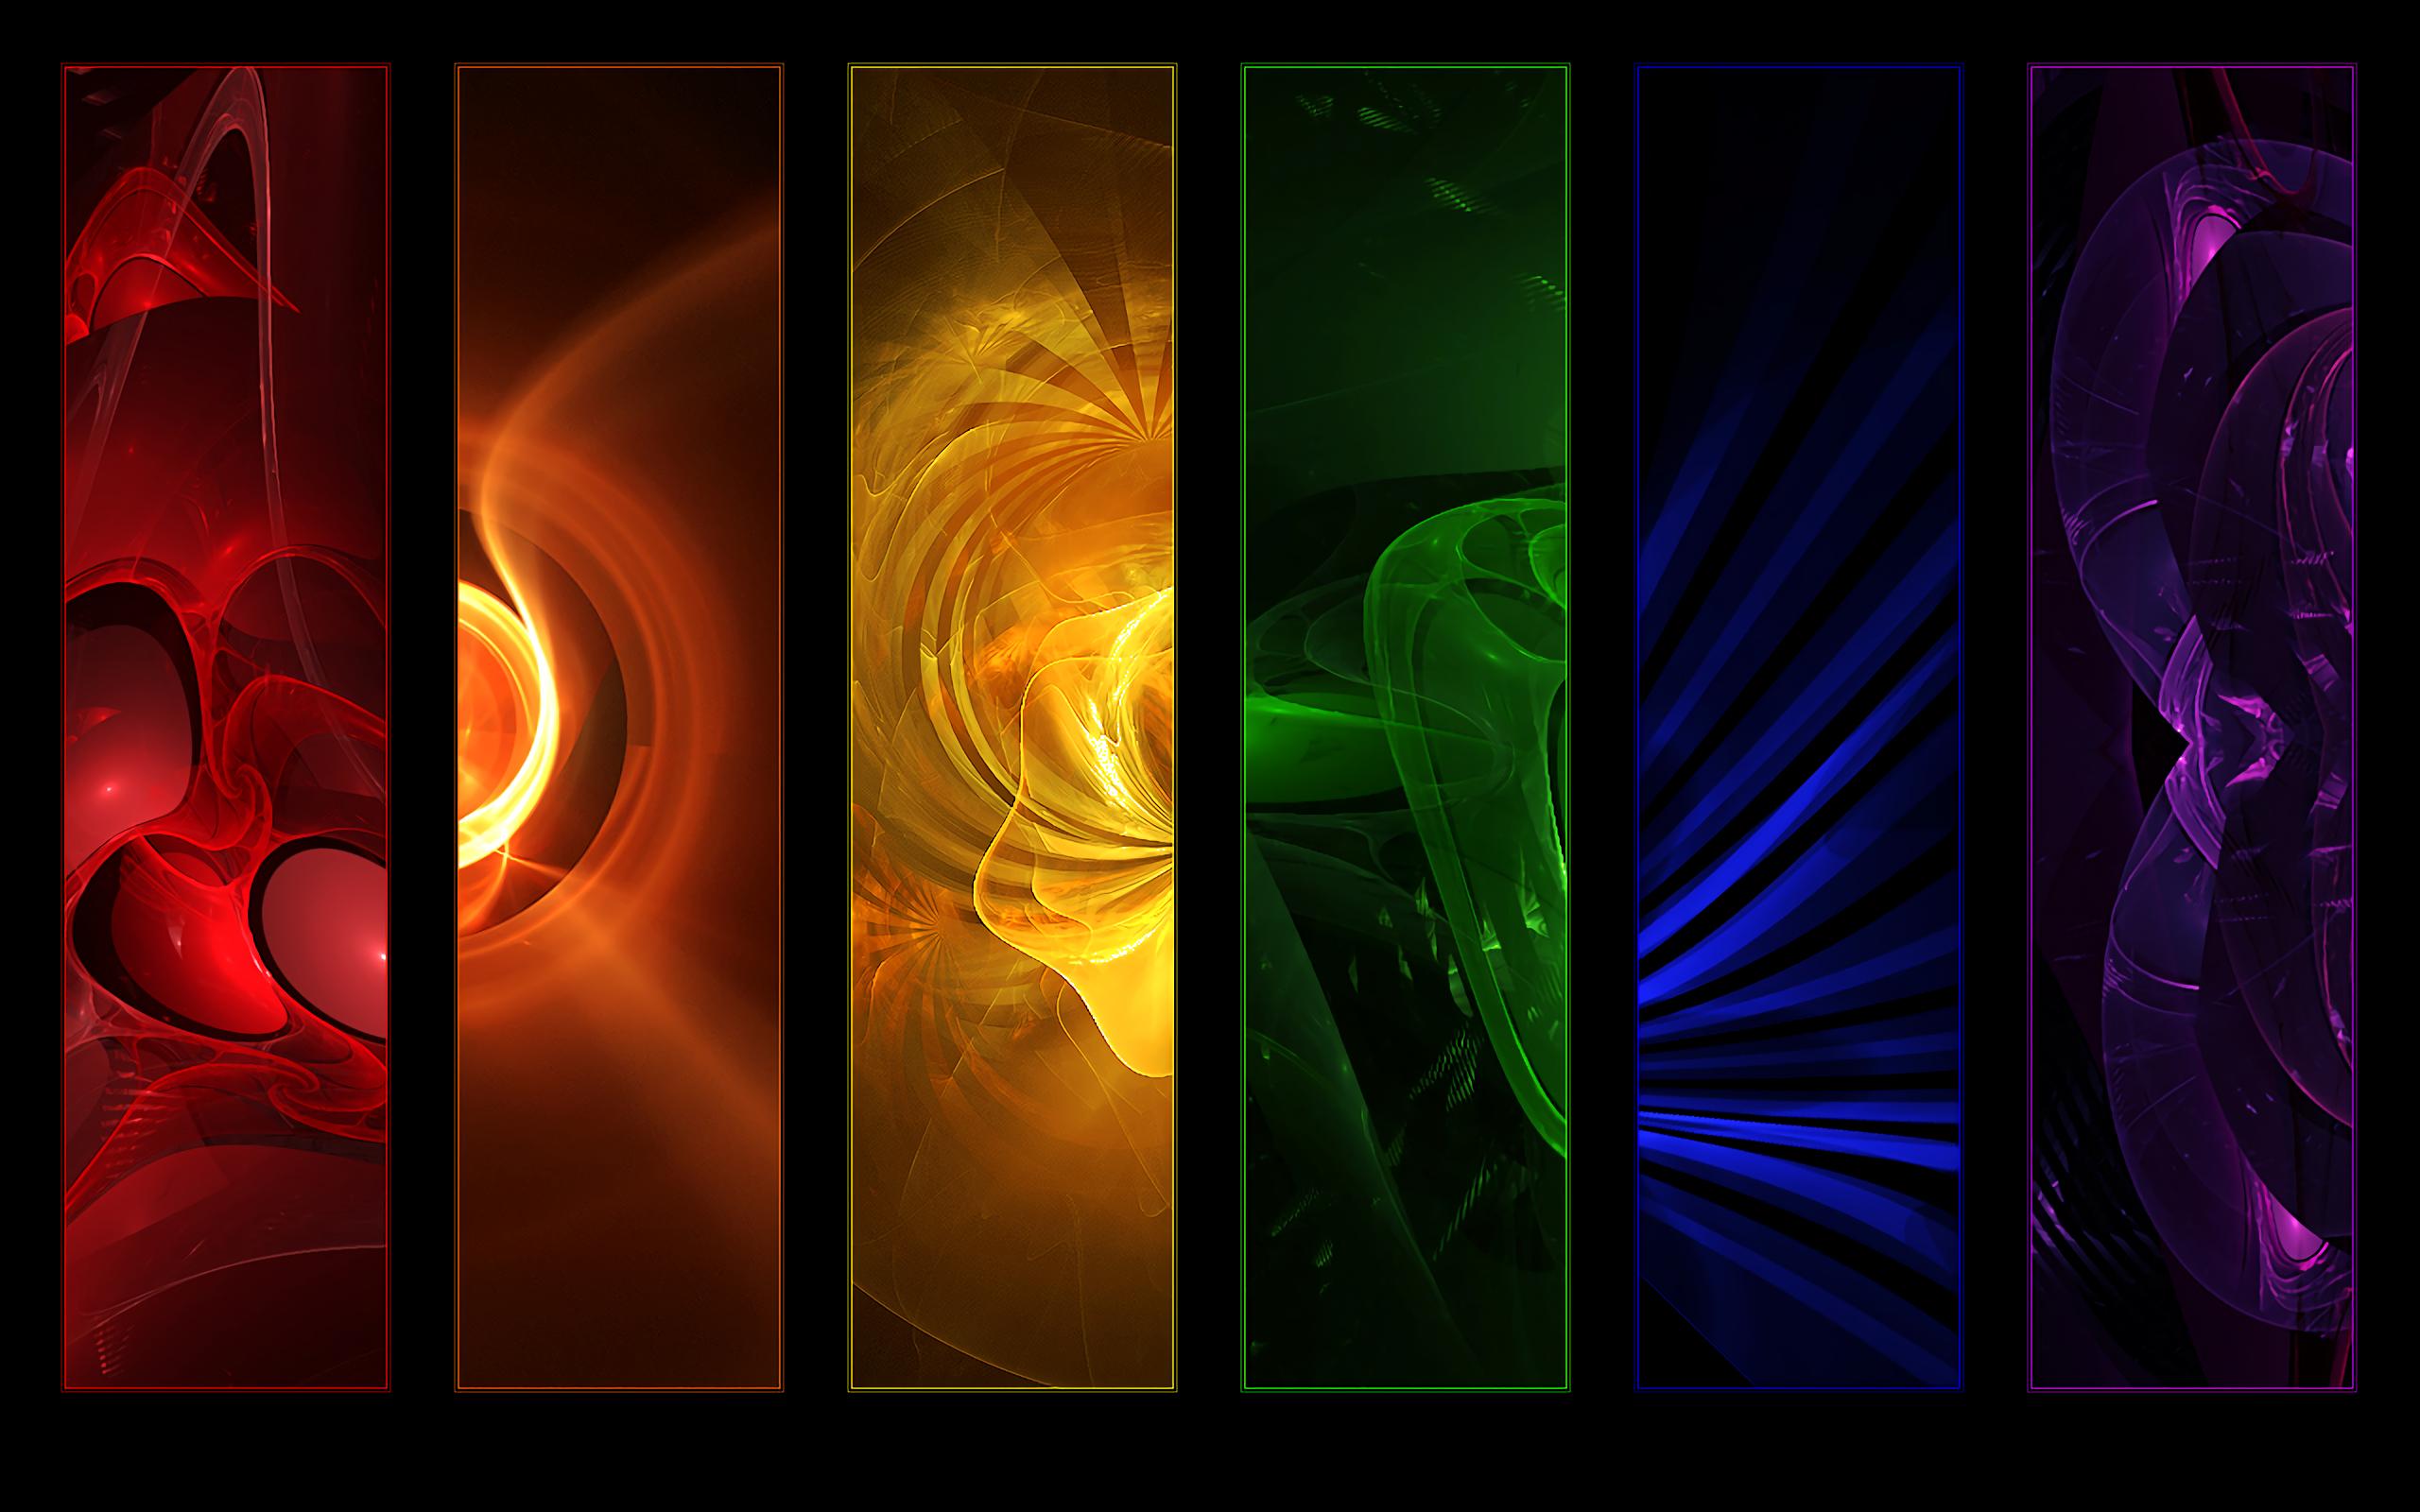 Cool HD Wallpaper Background Image 2560x1600 ID8788 2560x1600